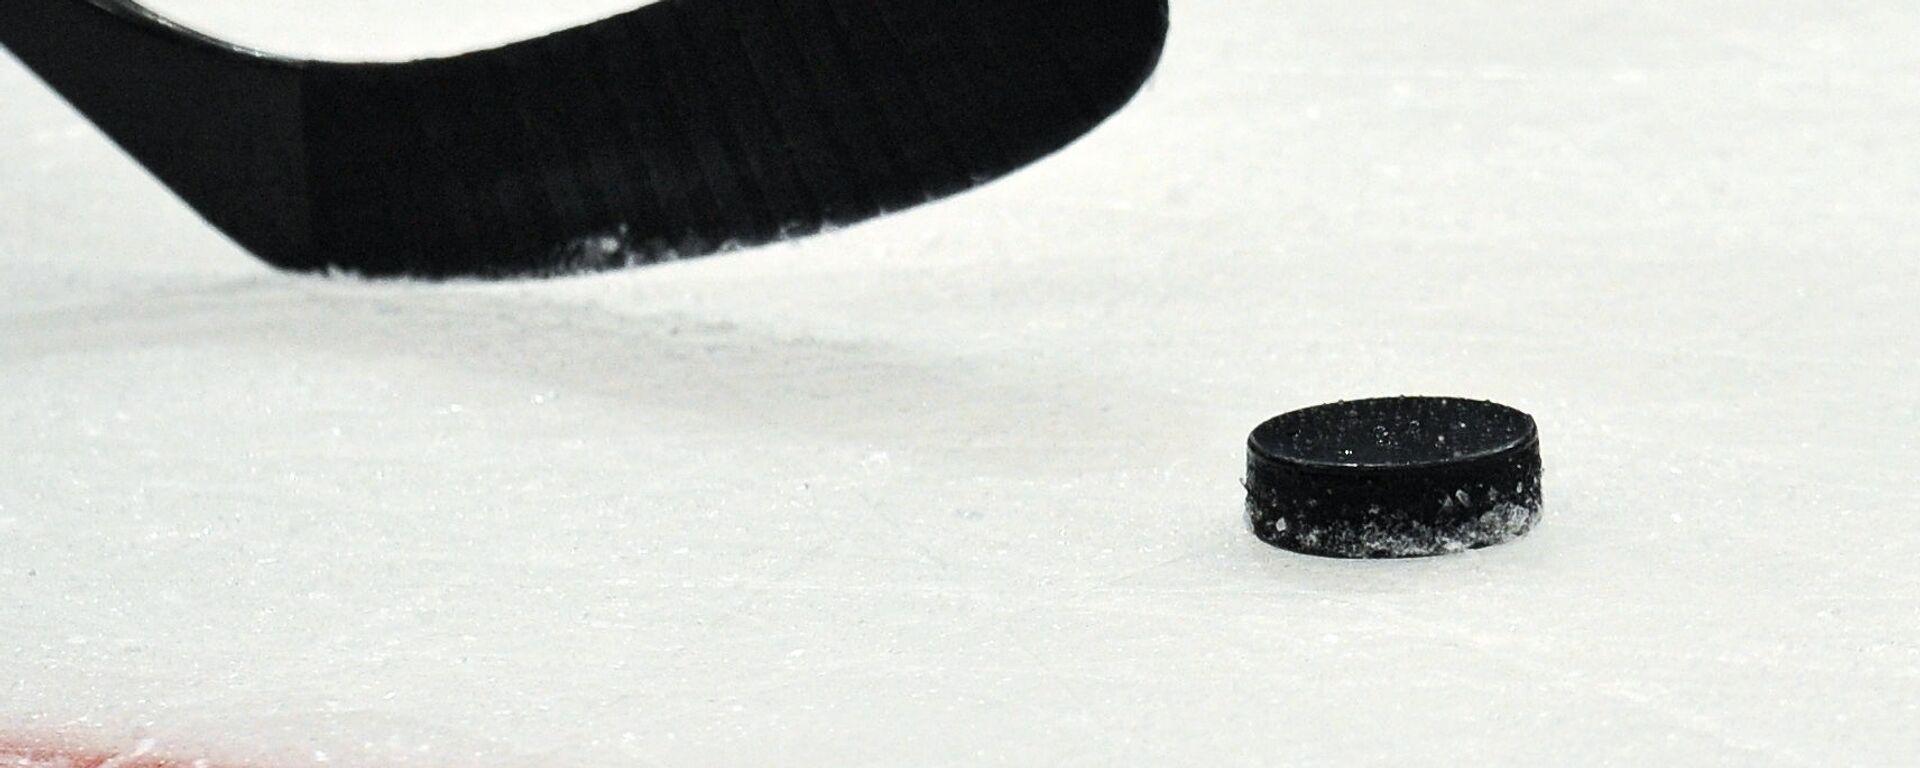 Хоккей - Sputnik Латвия, 1920, 22.08.2021